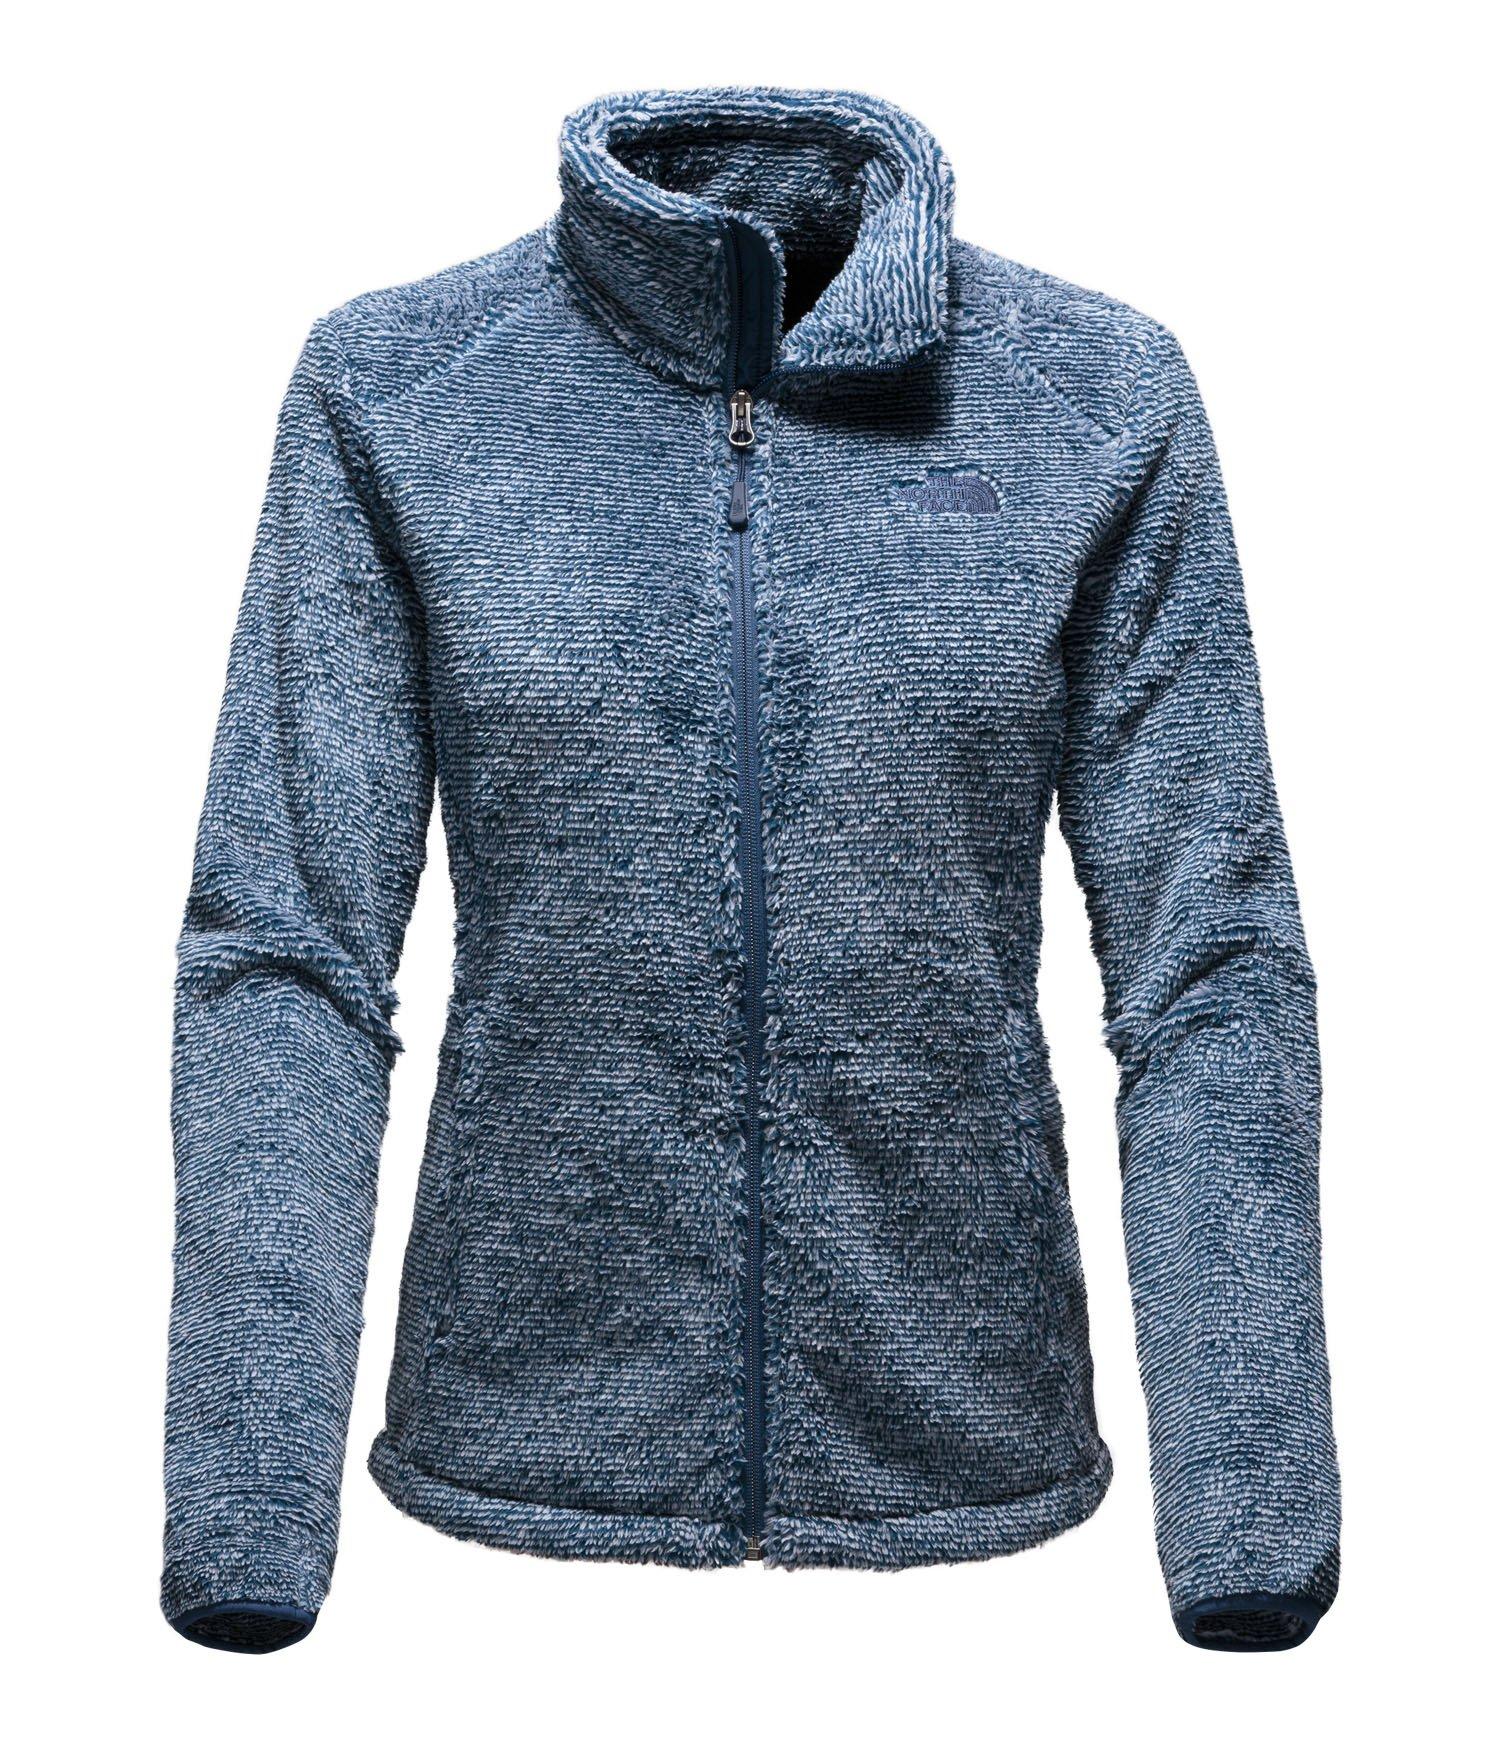 The North Face Women's Osito 2 Jacket Shady Blue Stripe Size Large